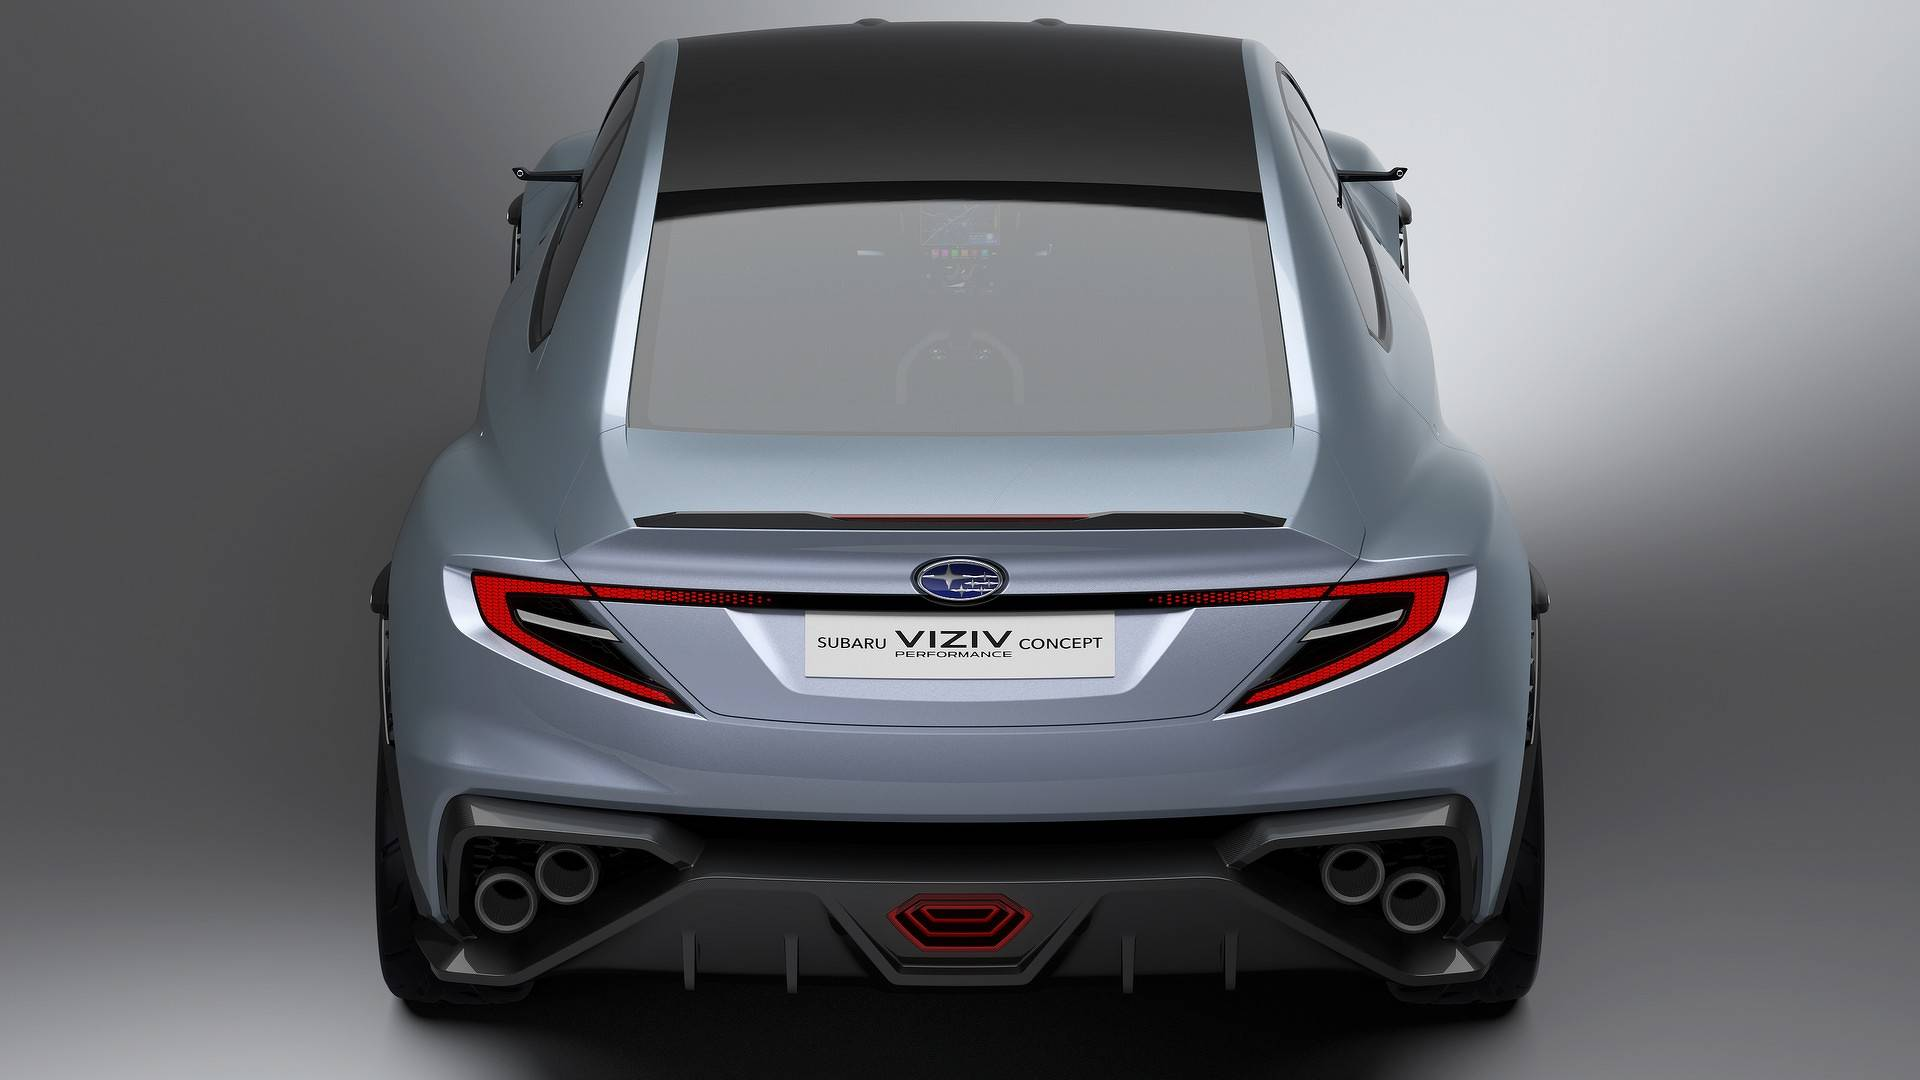 2022 subaru wrx sti expected with fa24 2 4-liter turbo boxer engine  400 hp